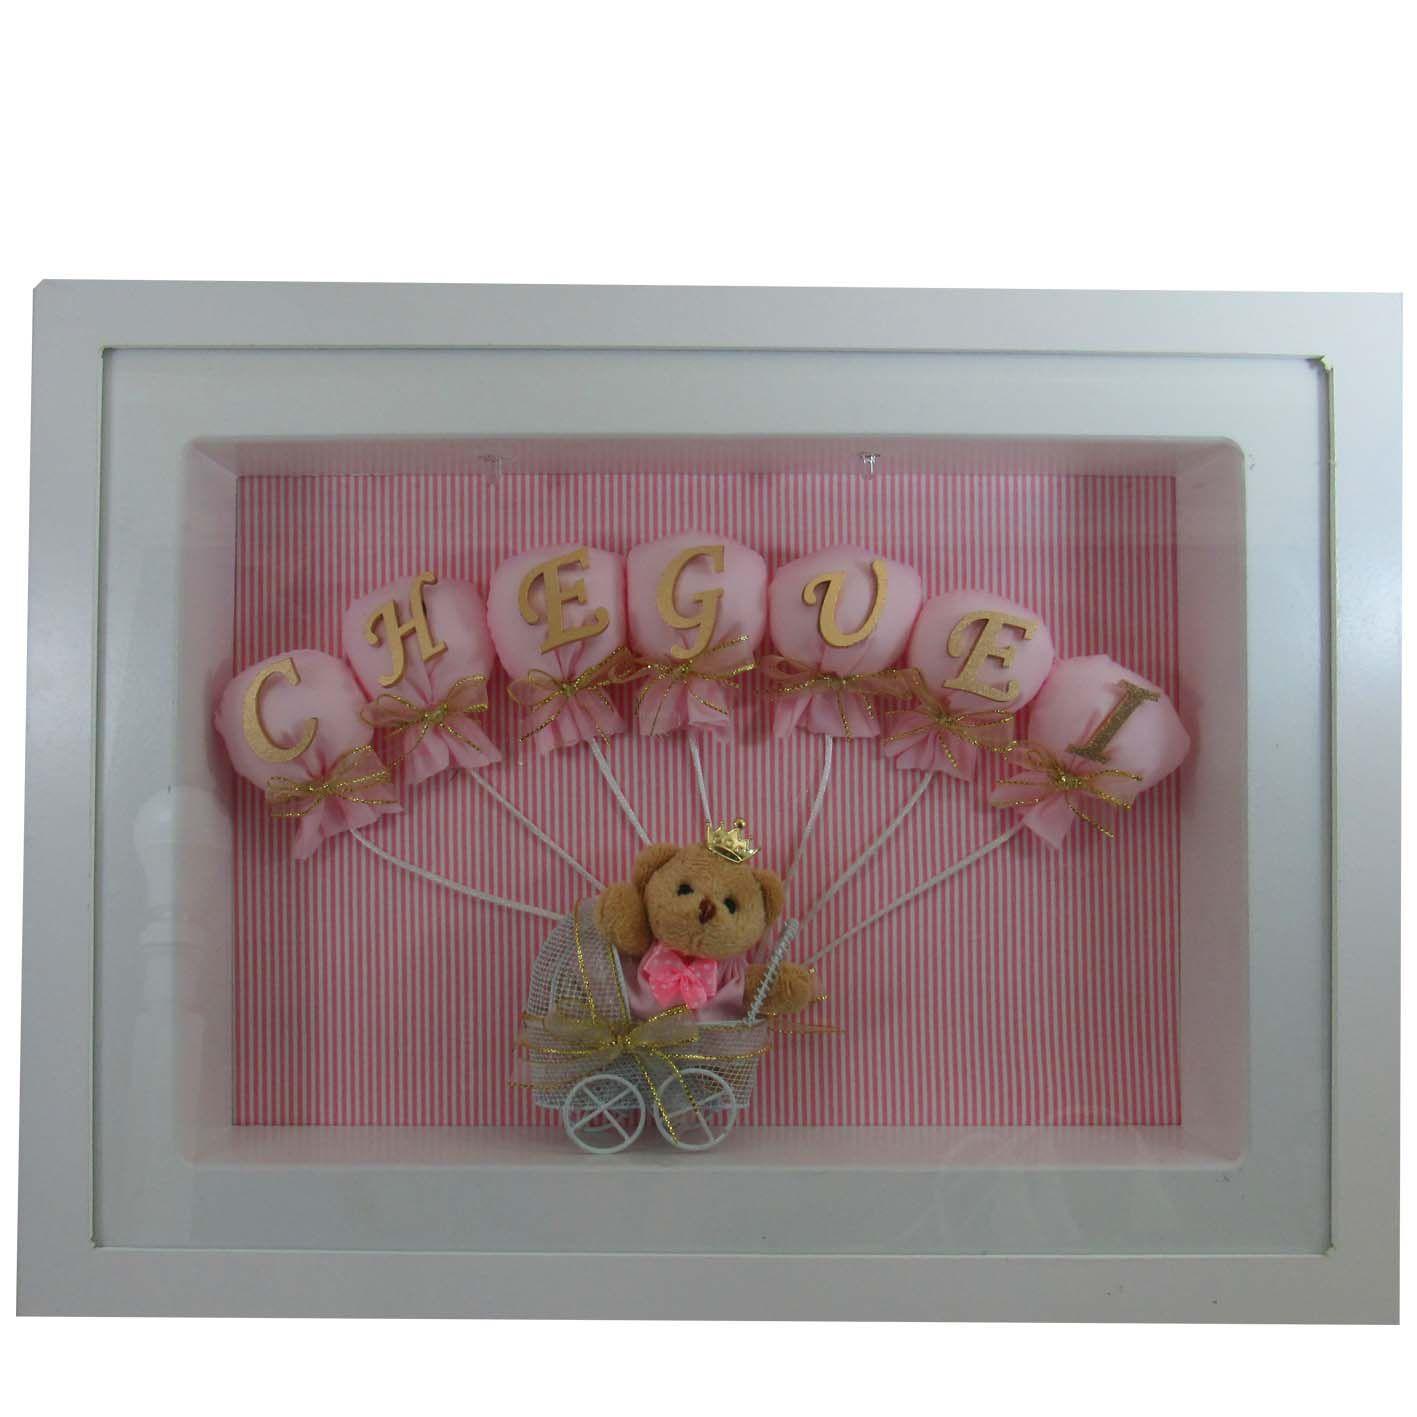 Quadro Porta Maternidade - Cheguei Menina